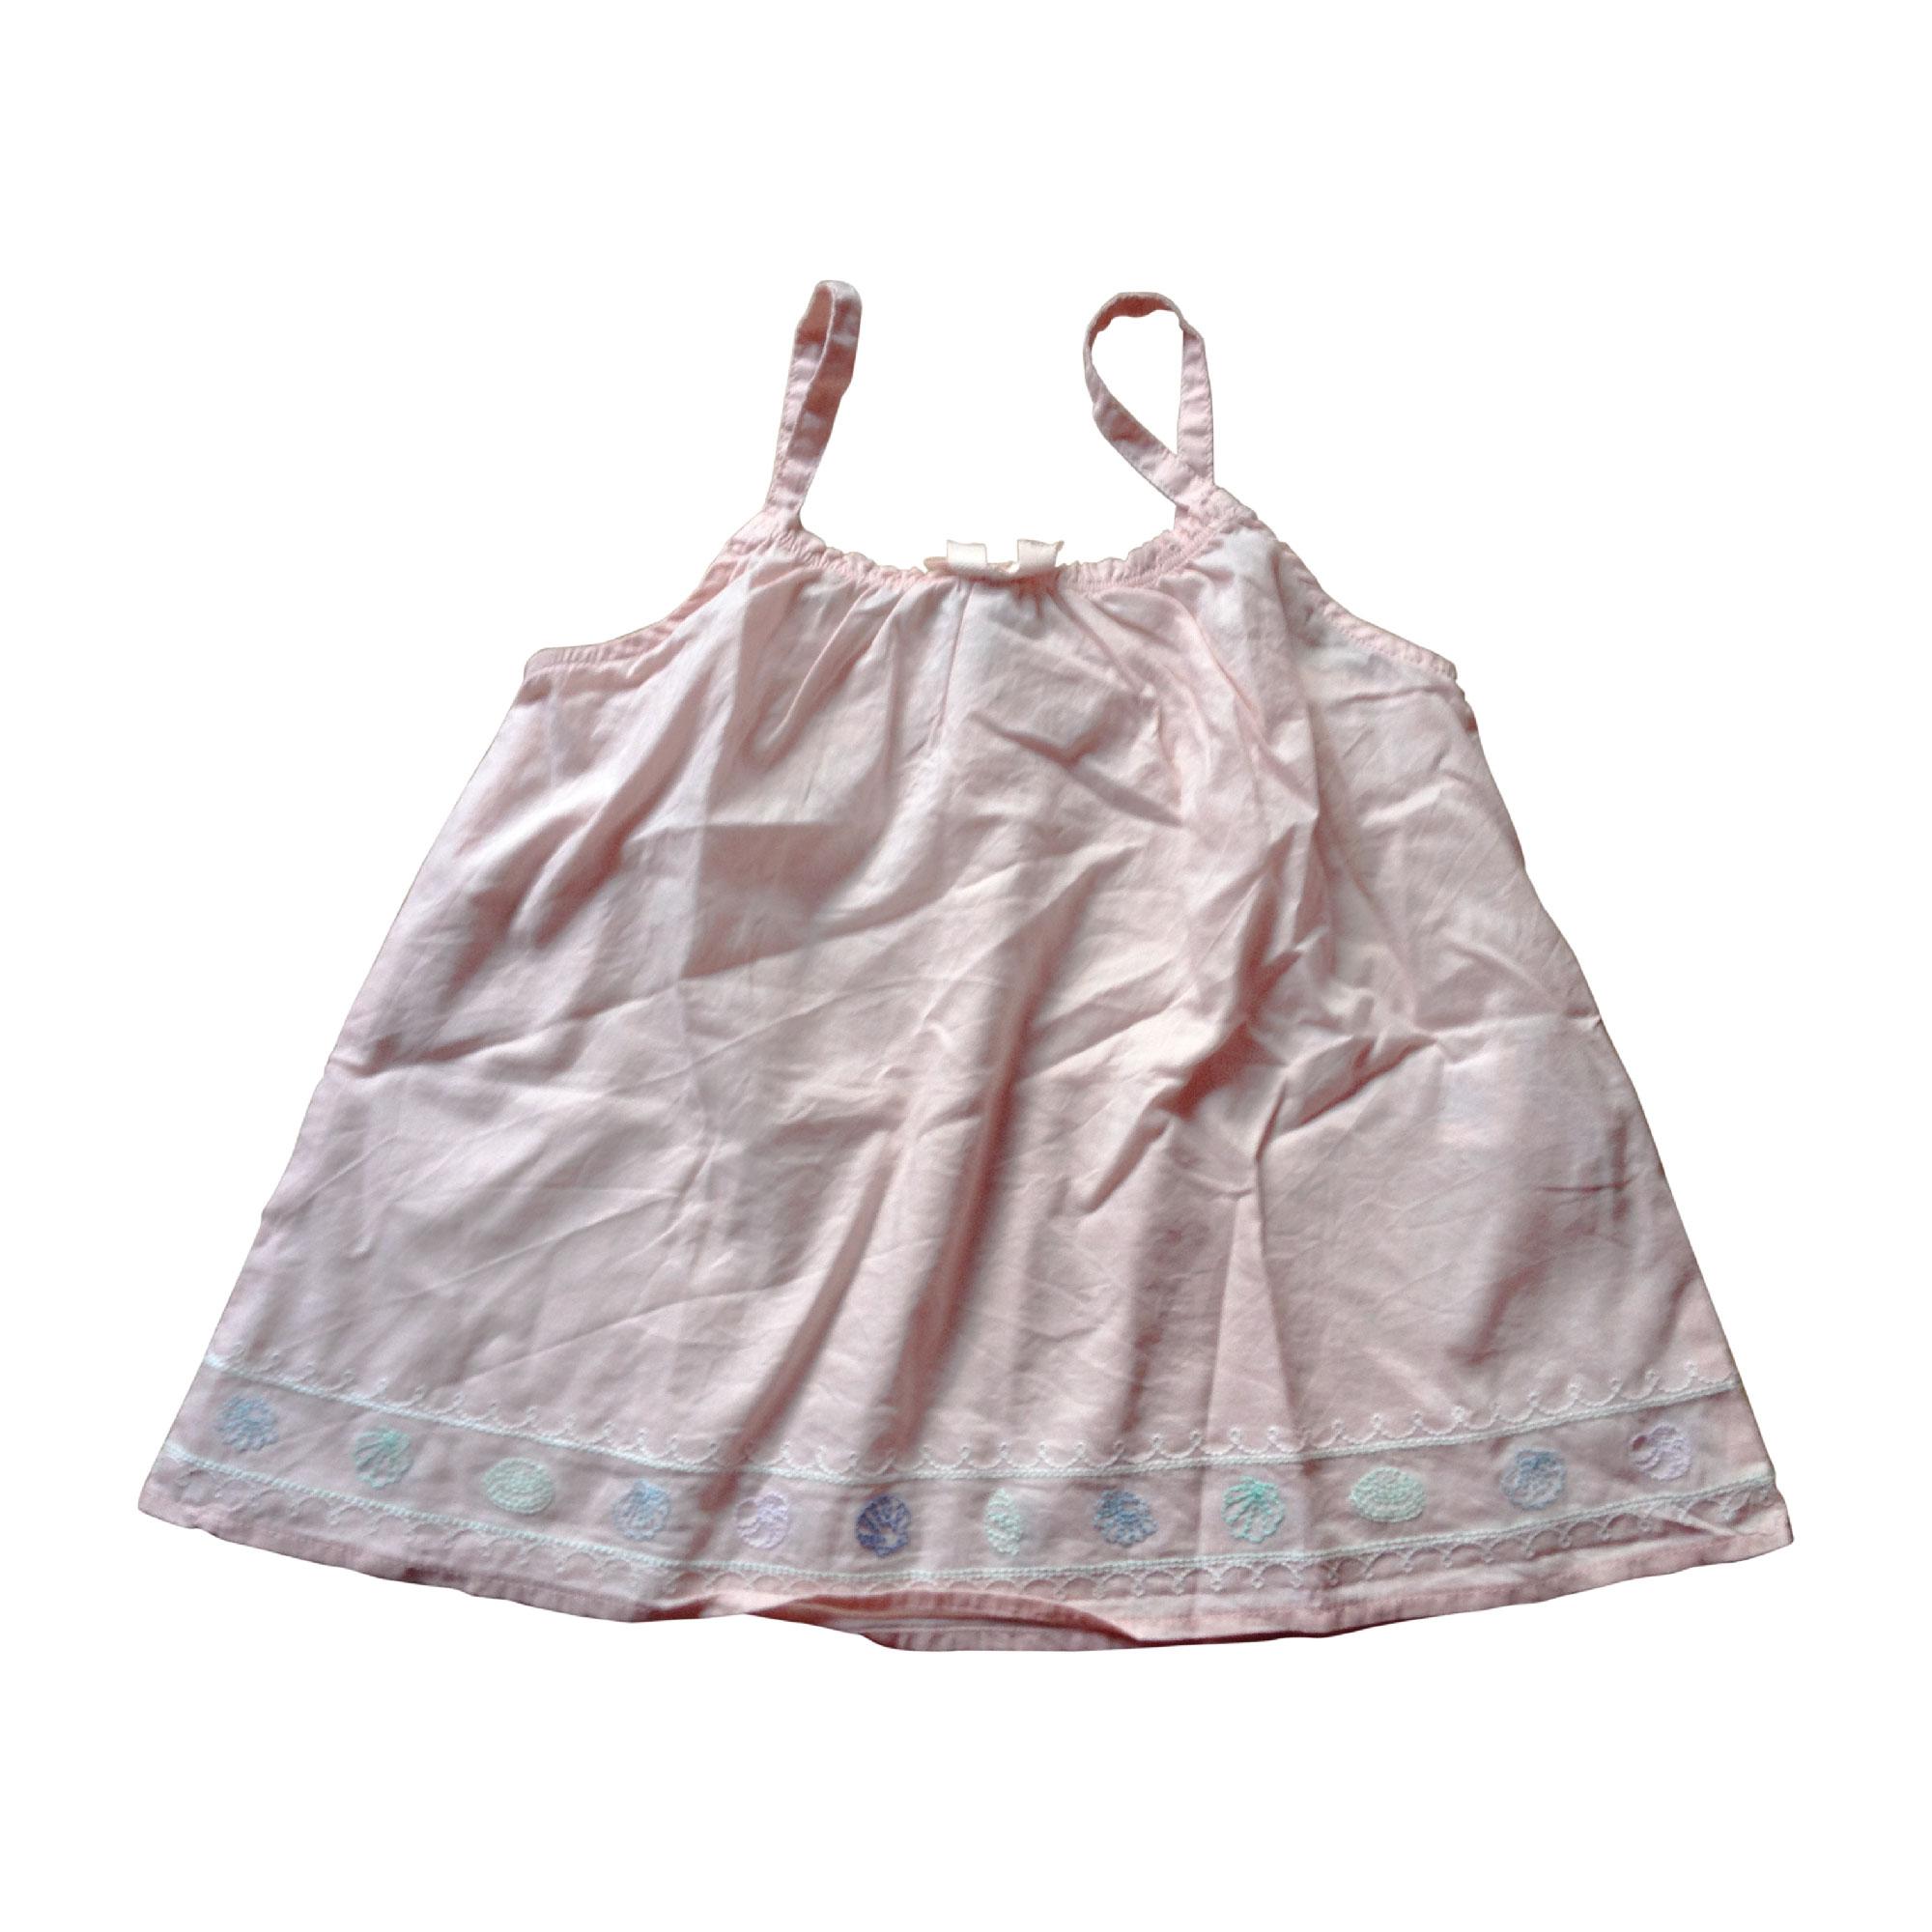 Top, Tee-shirt SERGENT MAJOR Rose, fuschia, vieux rose